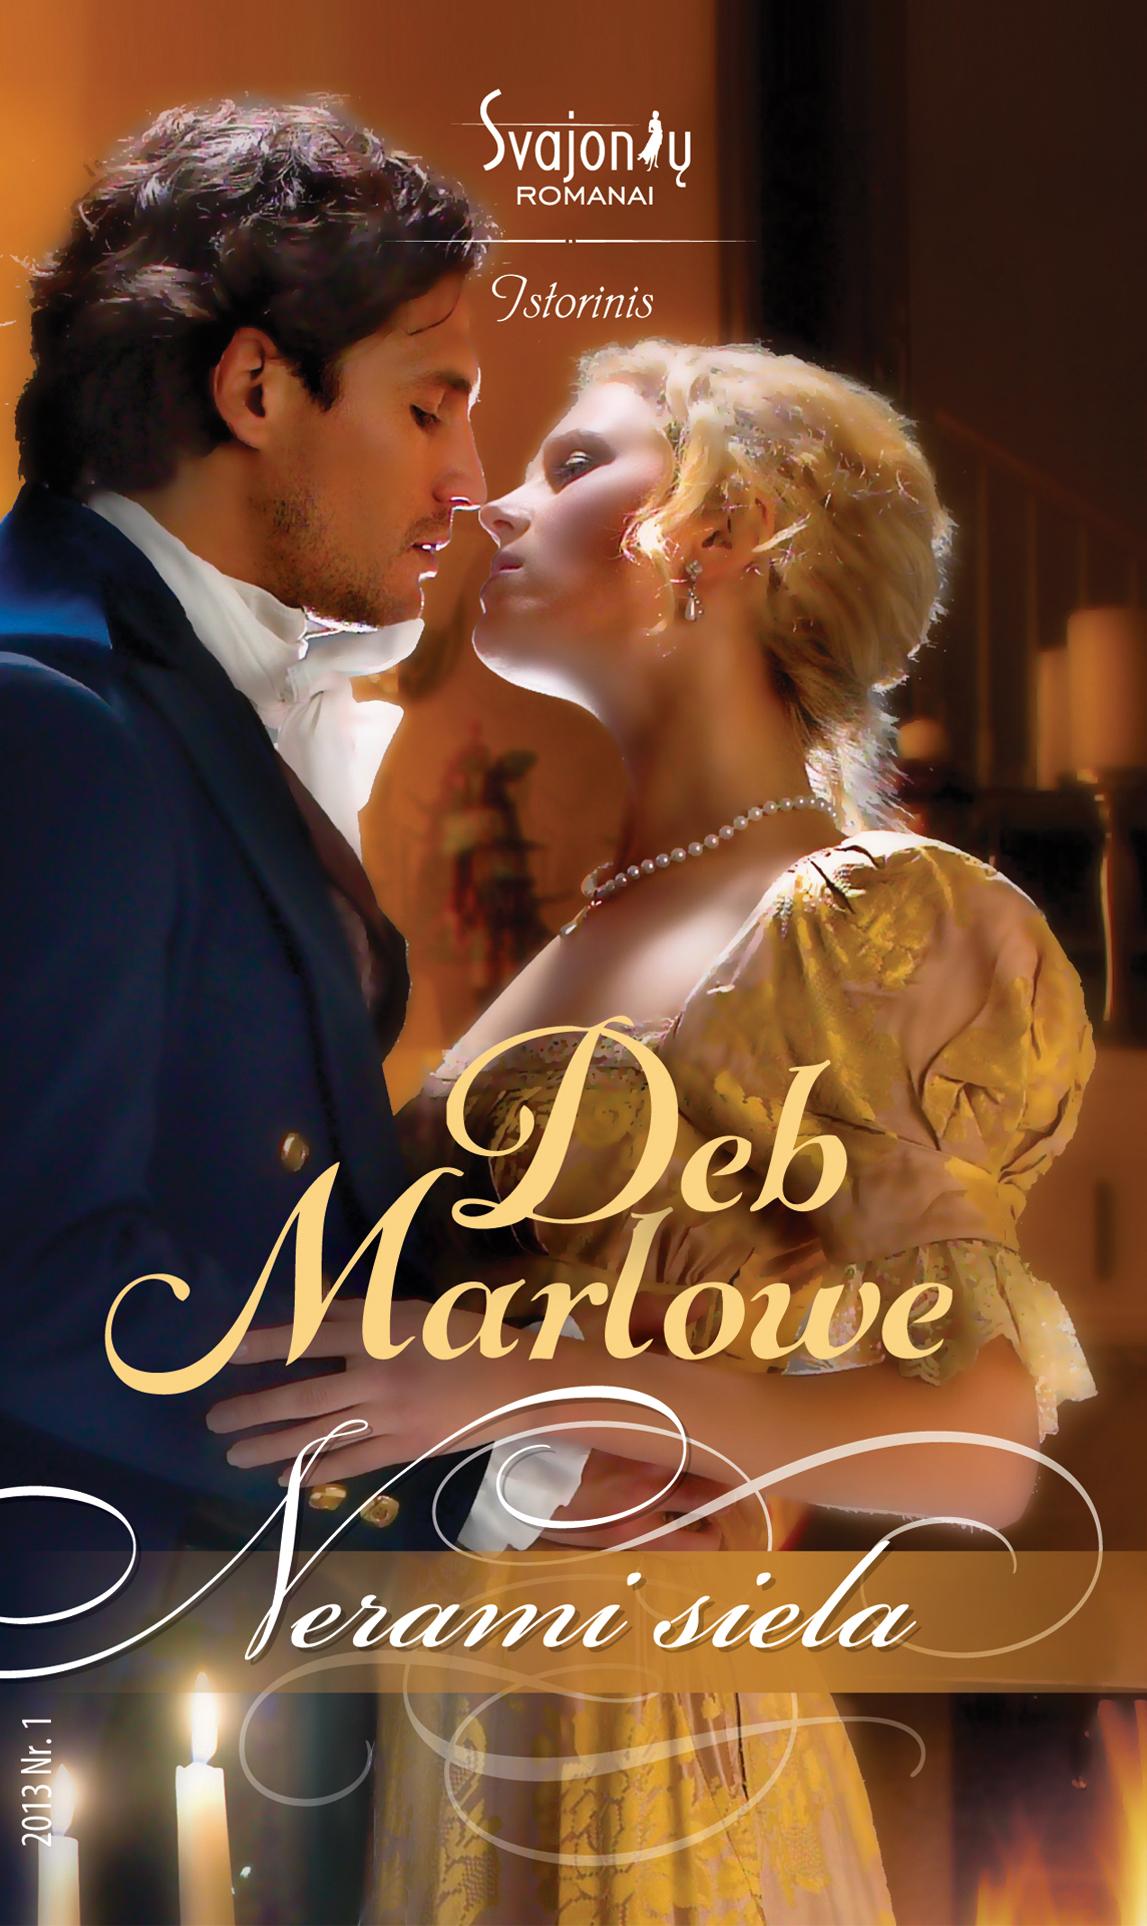 Deb Marlowe Nerami siela deb marlowe an improper aristocrat